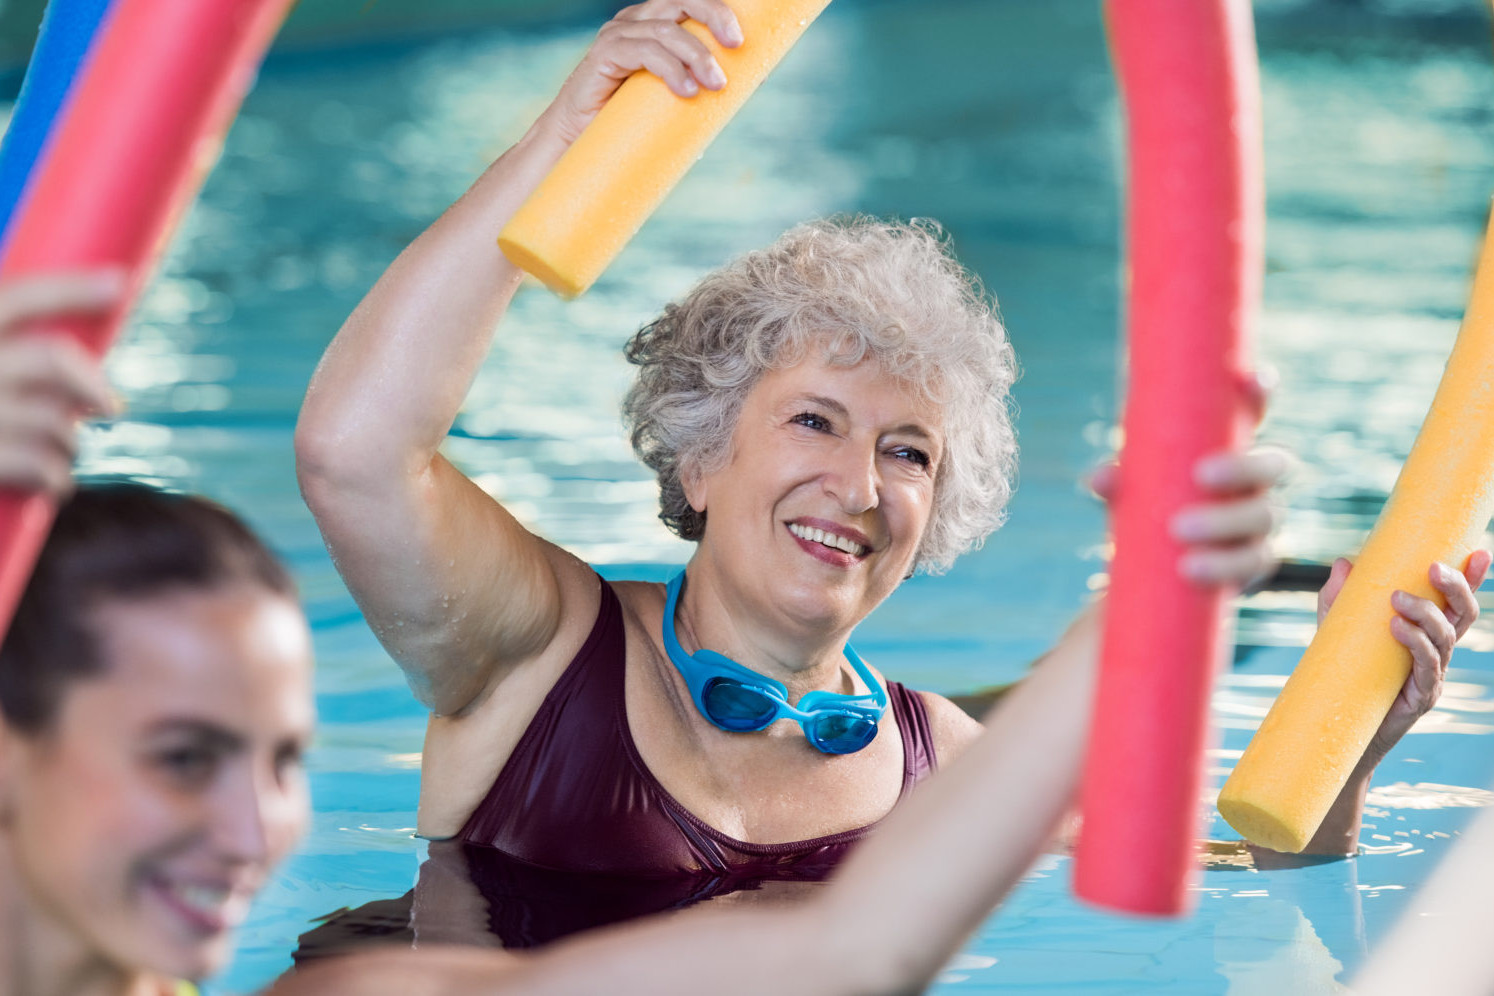 WaterWorks: Summer Hydration with Sonata